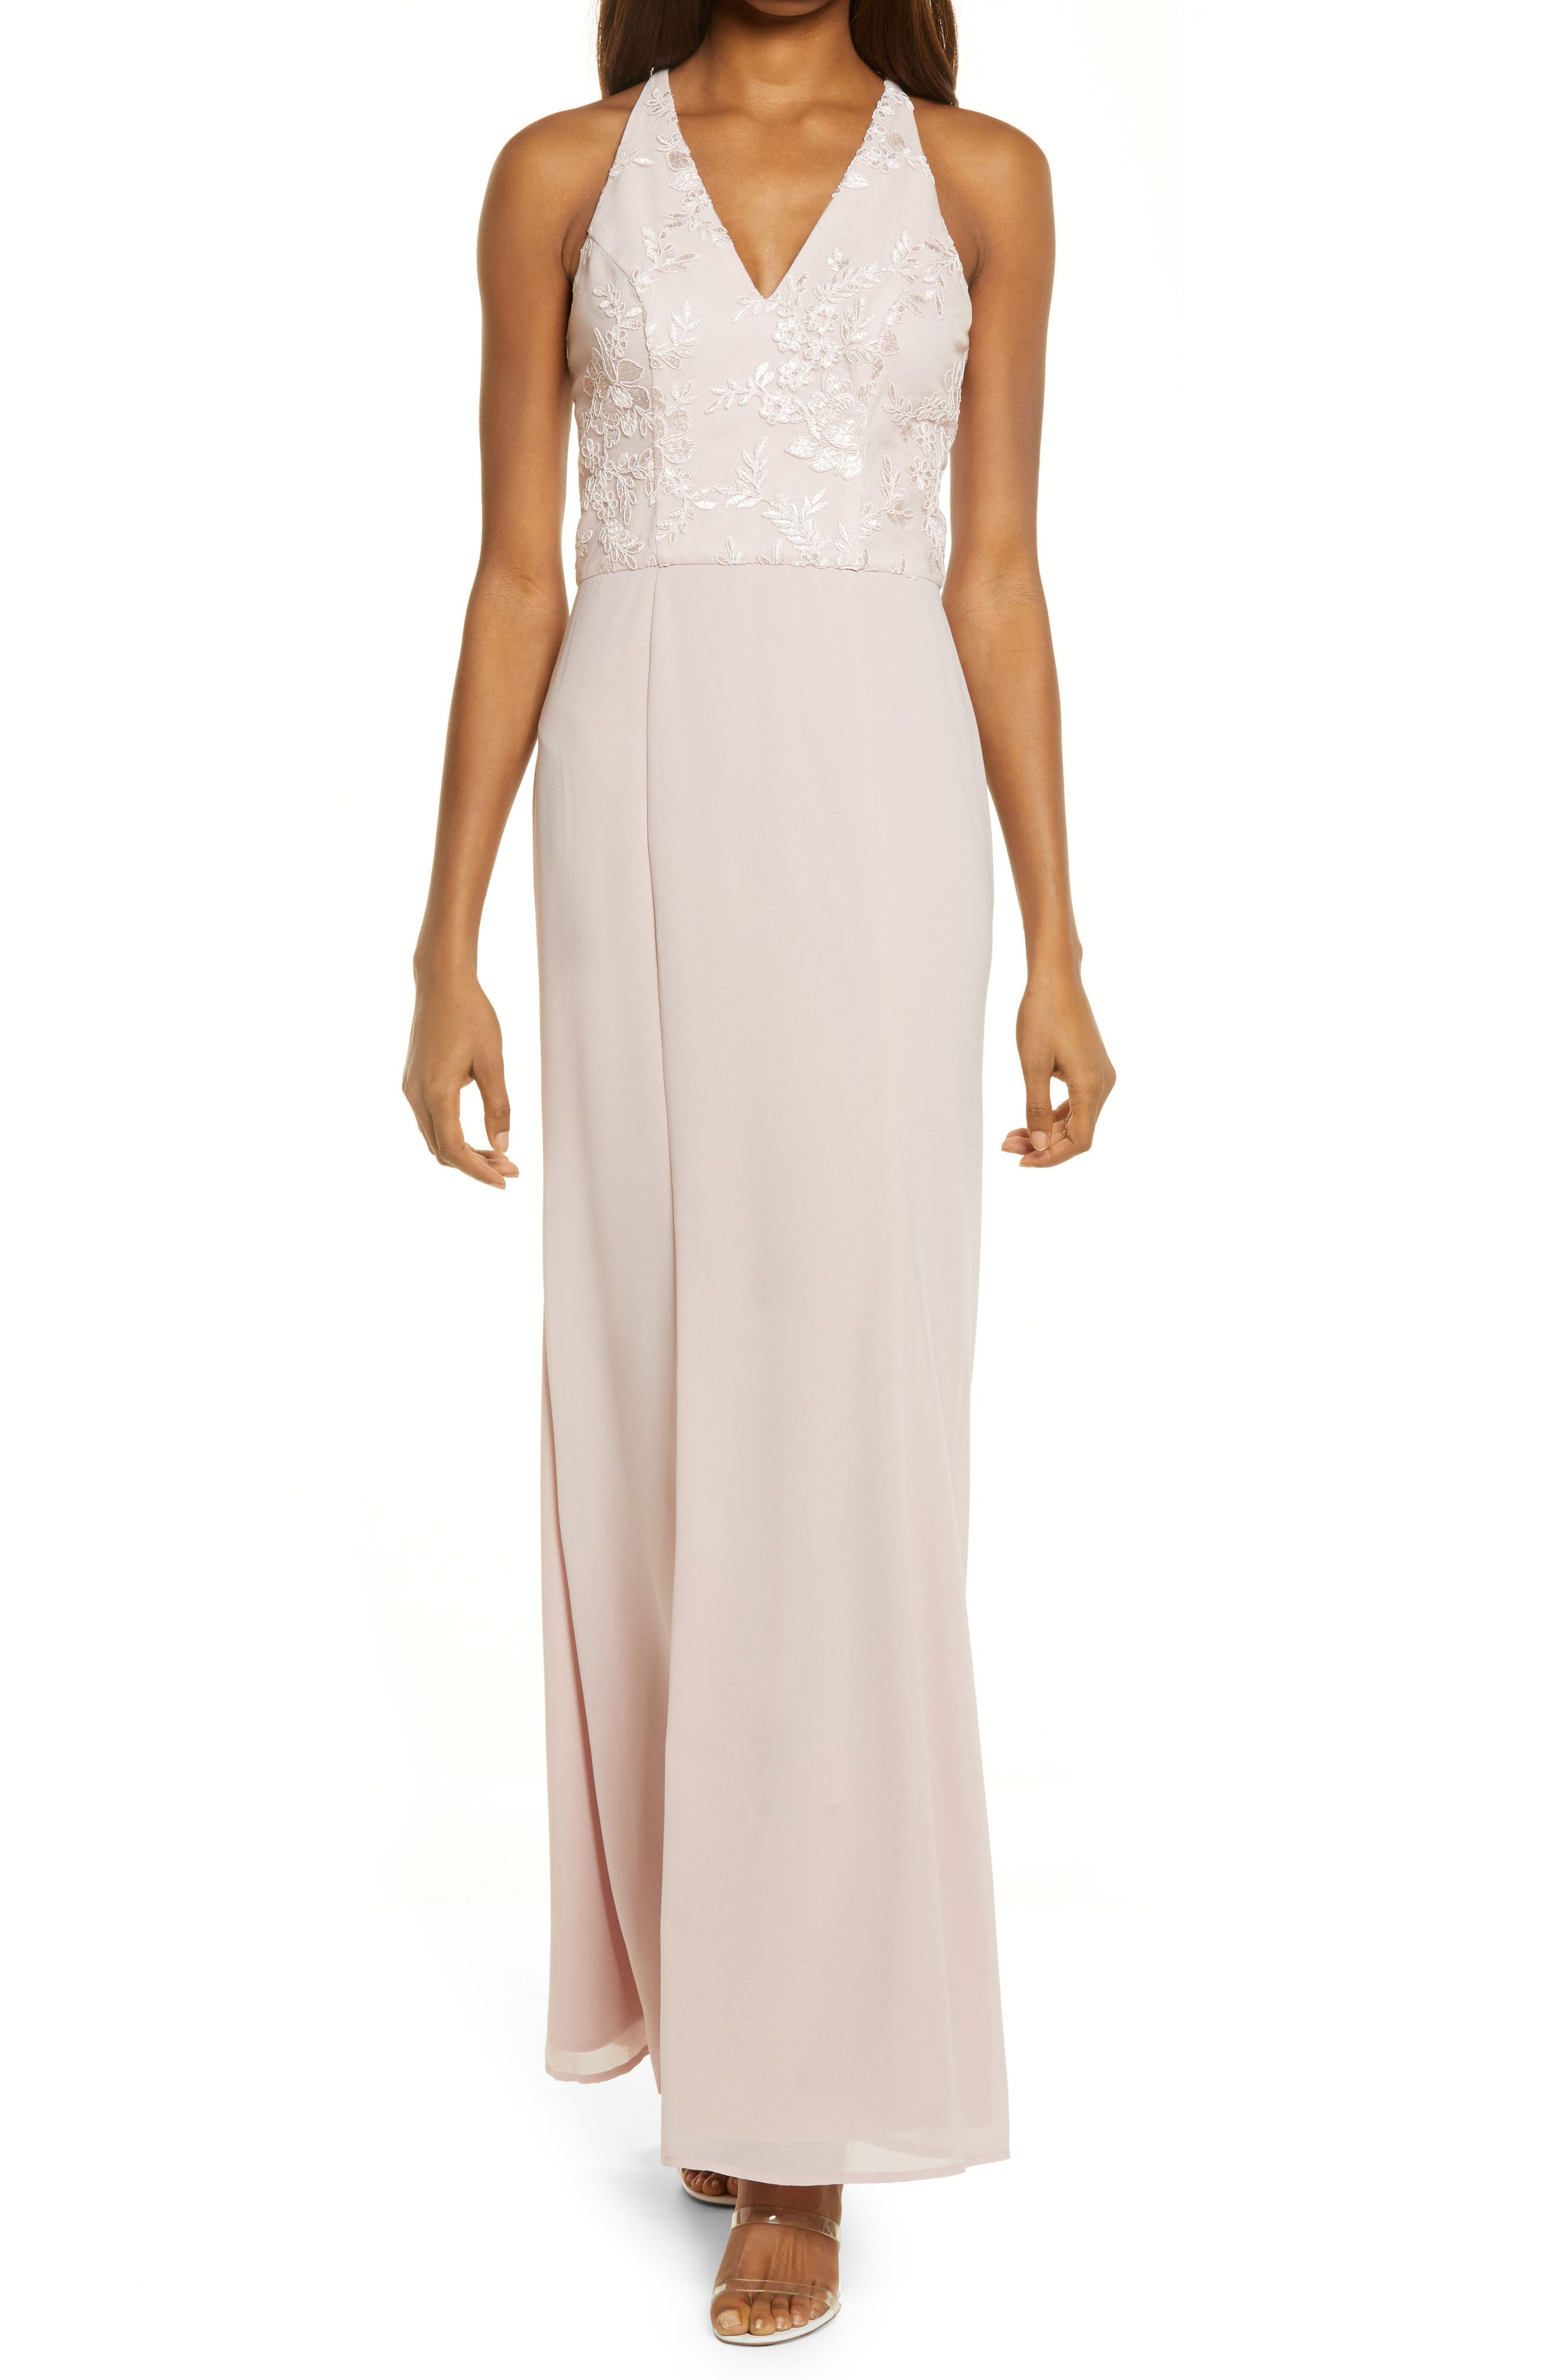 Sleeveless Lace Bridesmaid Dress